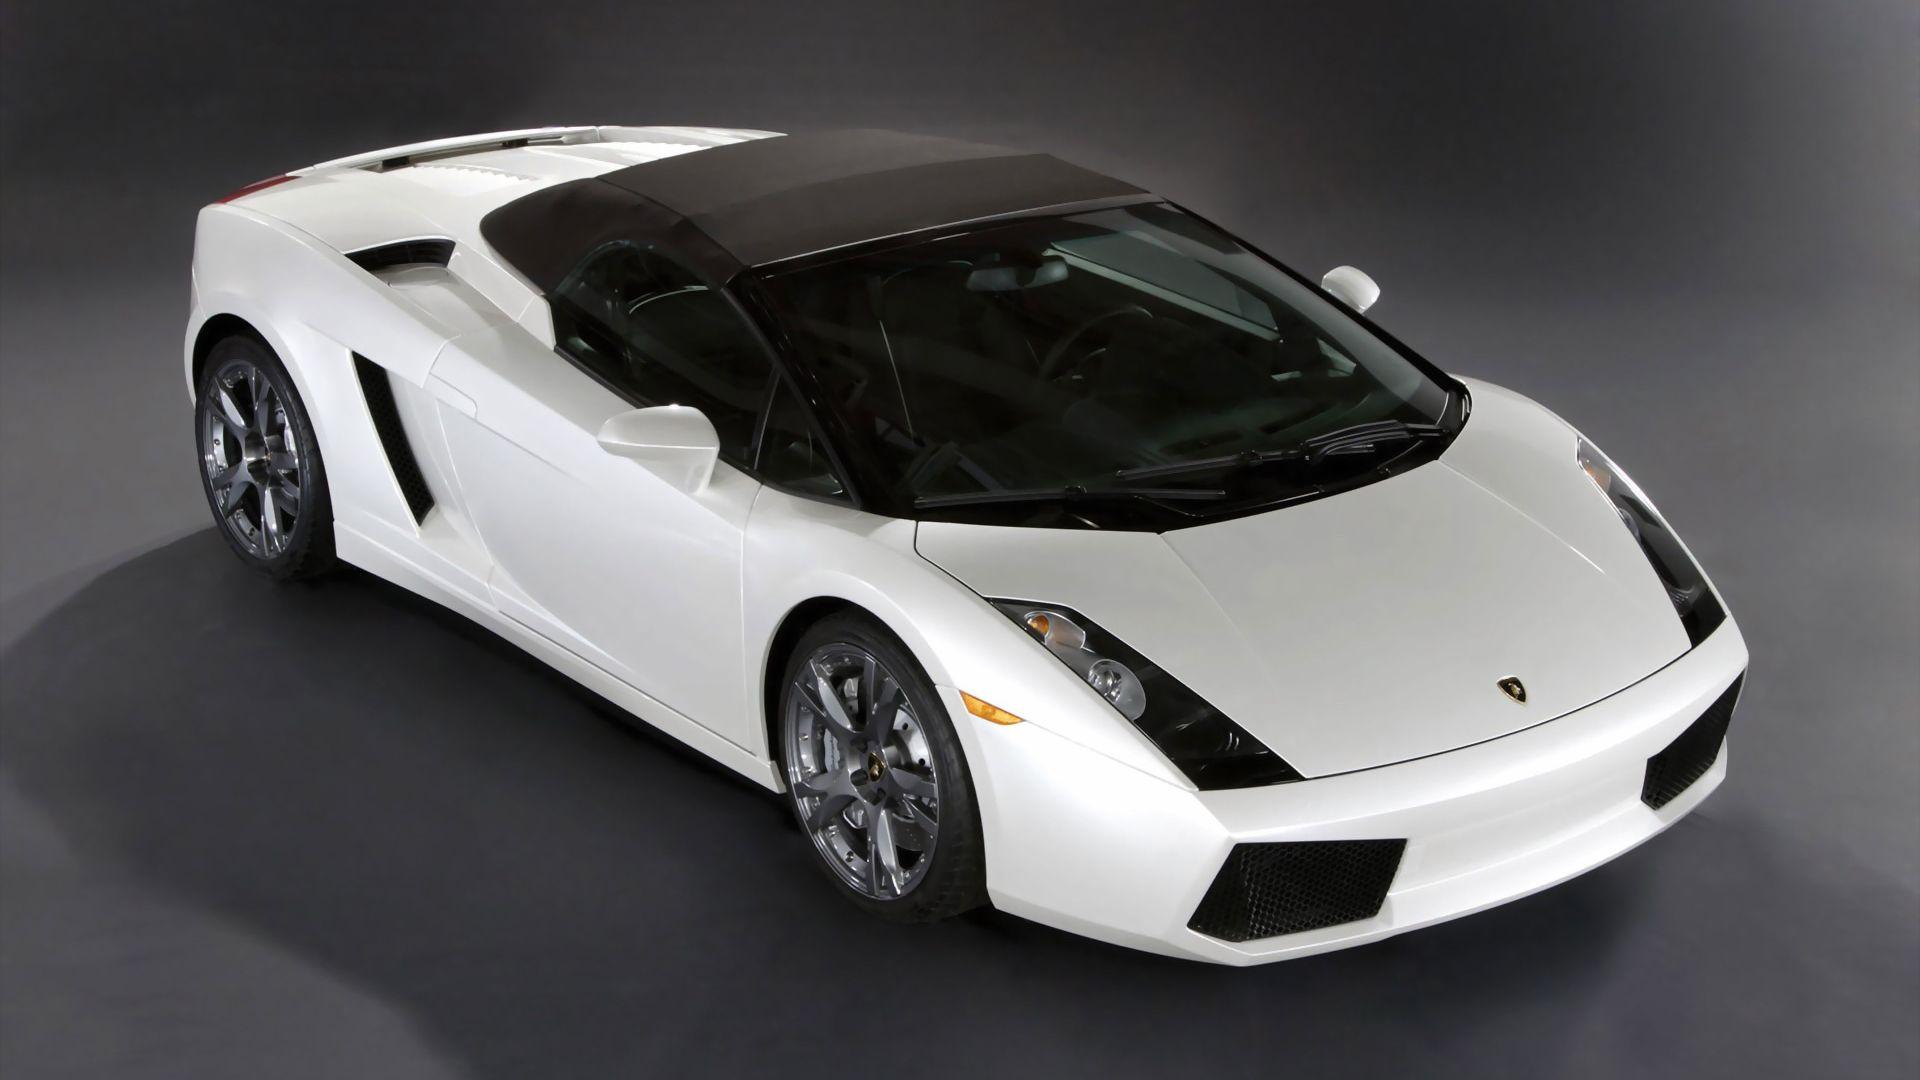 Modifikasi Lamborghini Terliar (© Mansory) | Super Car | Pinterest |  Lamborghini, Super Car And Cars